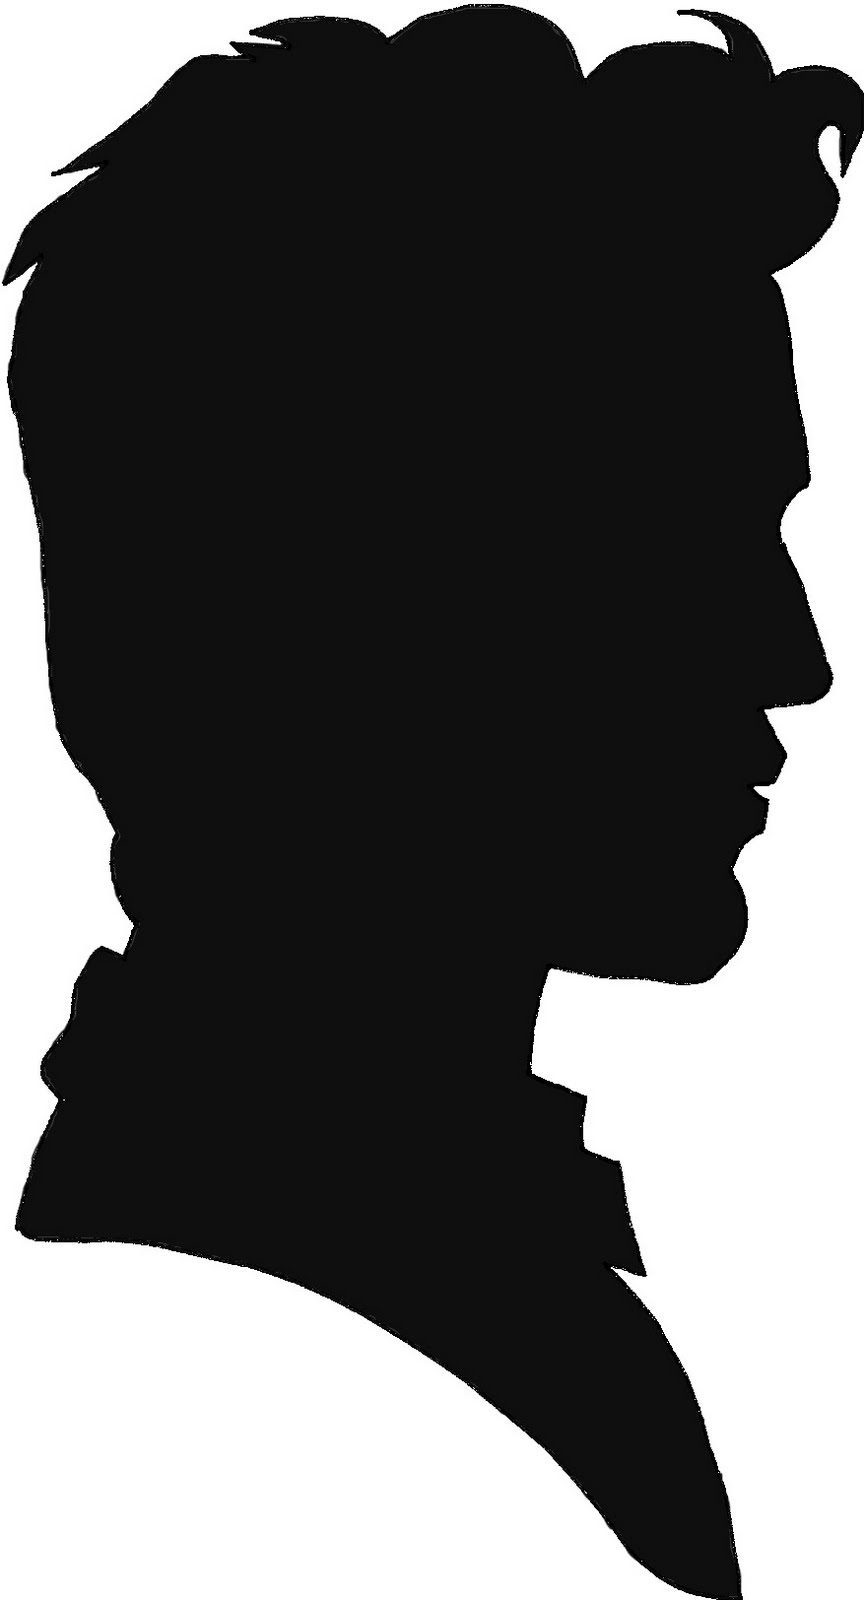 Head Silhouette Person Clipart Free 20 Free Cliparts